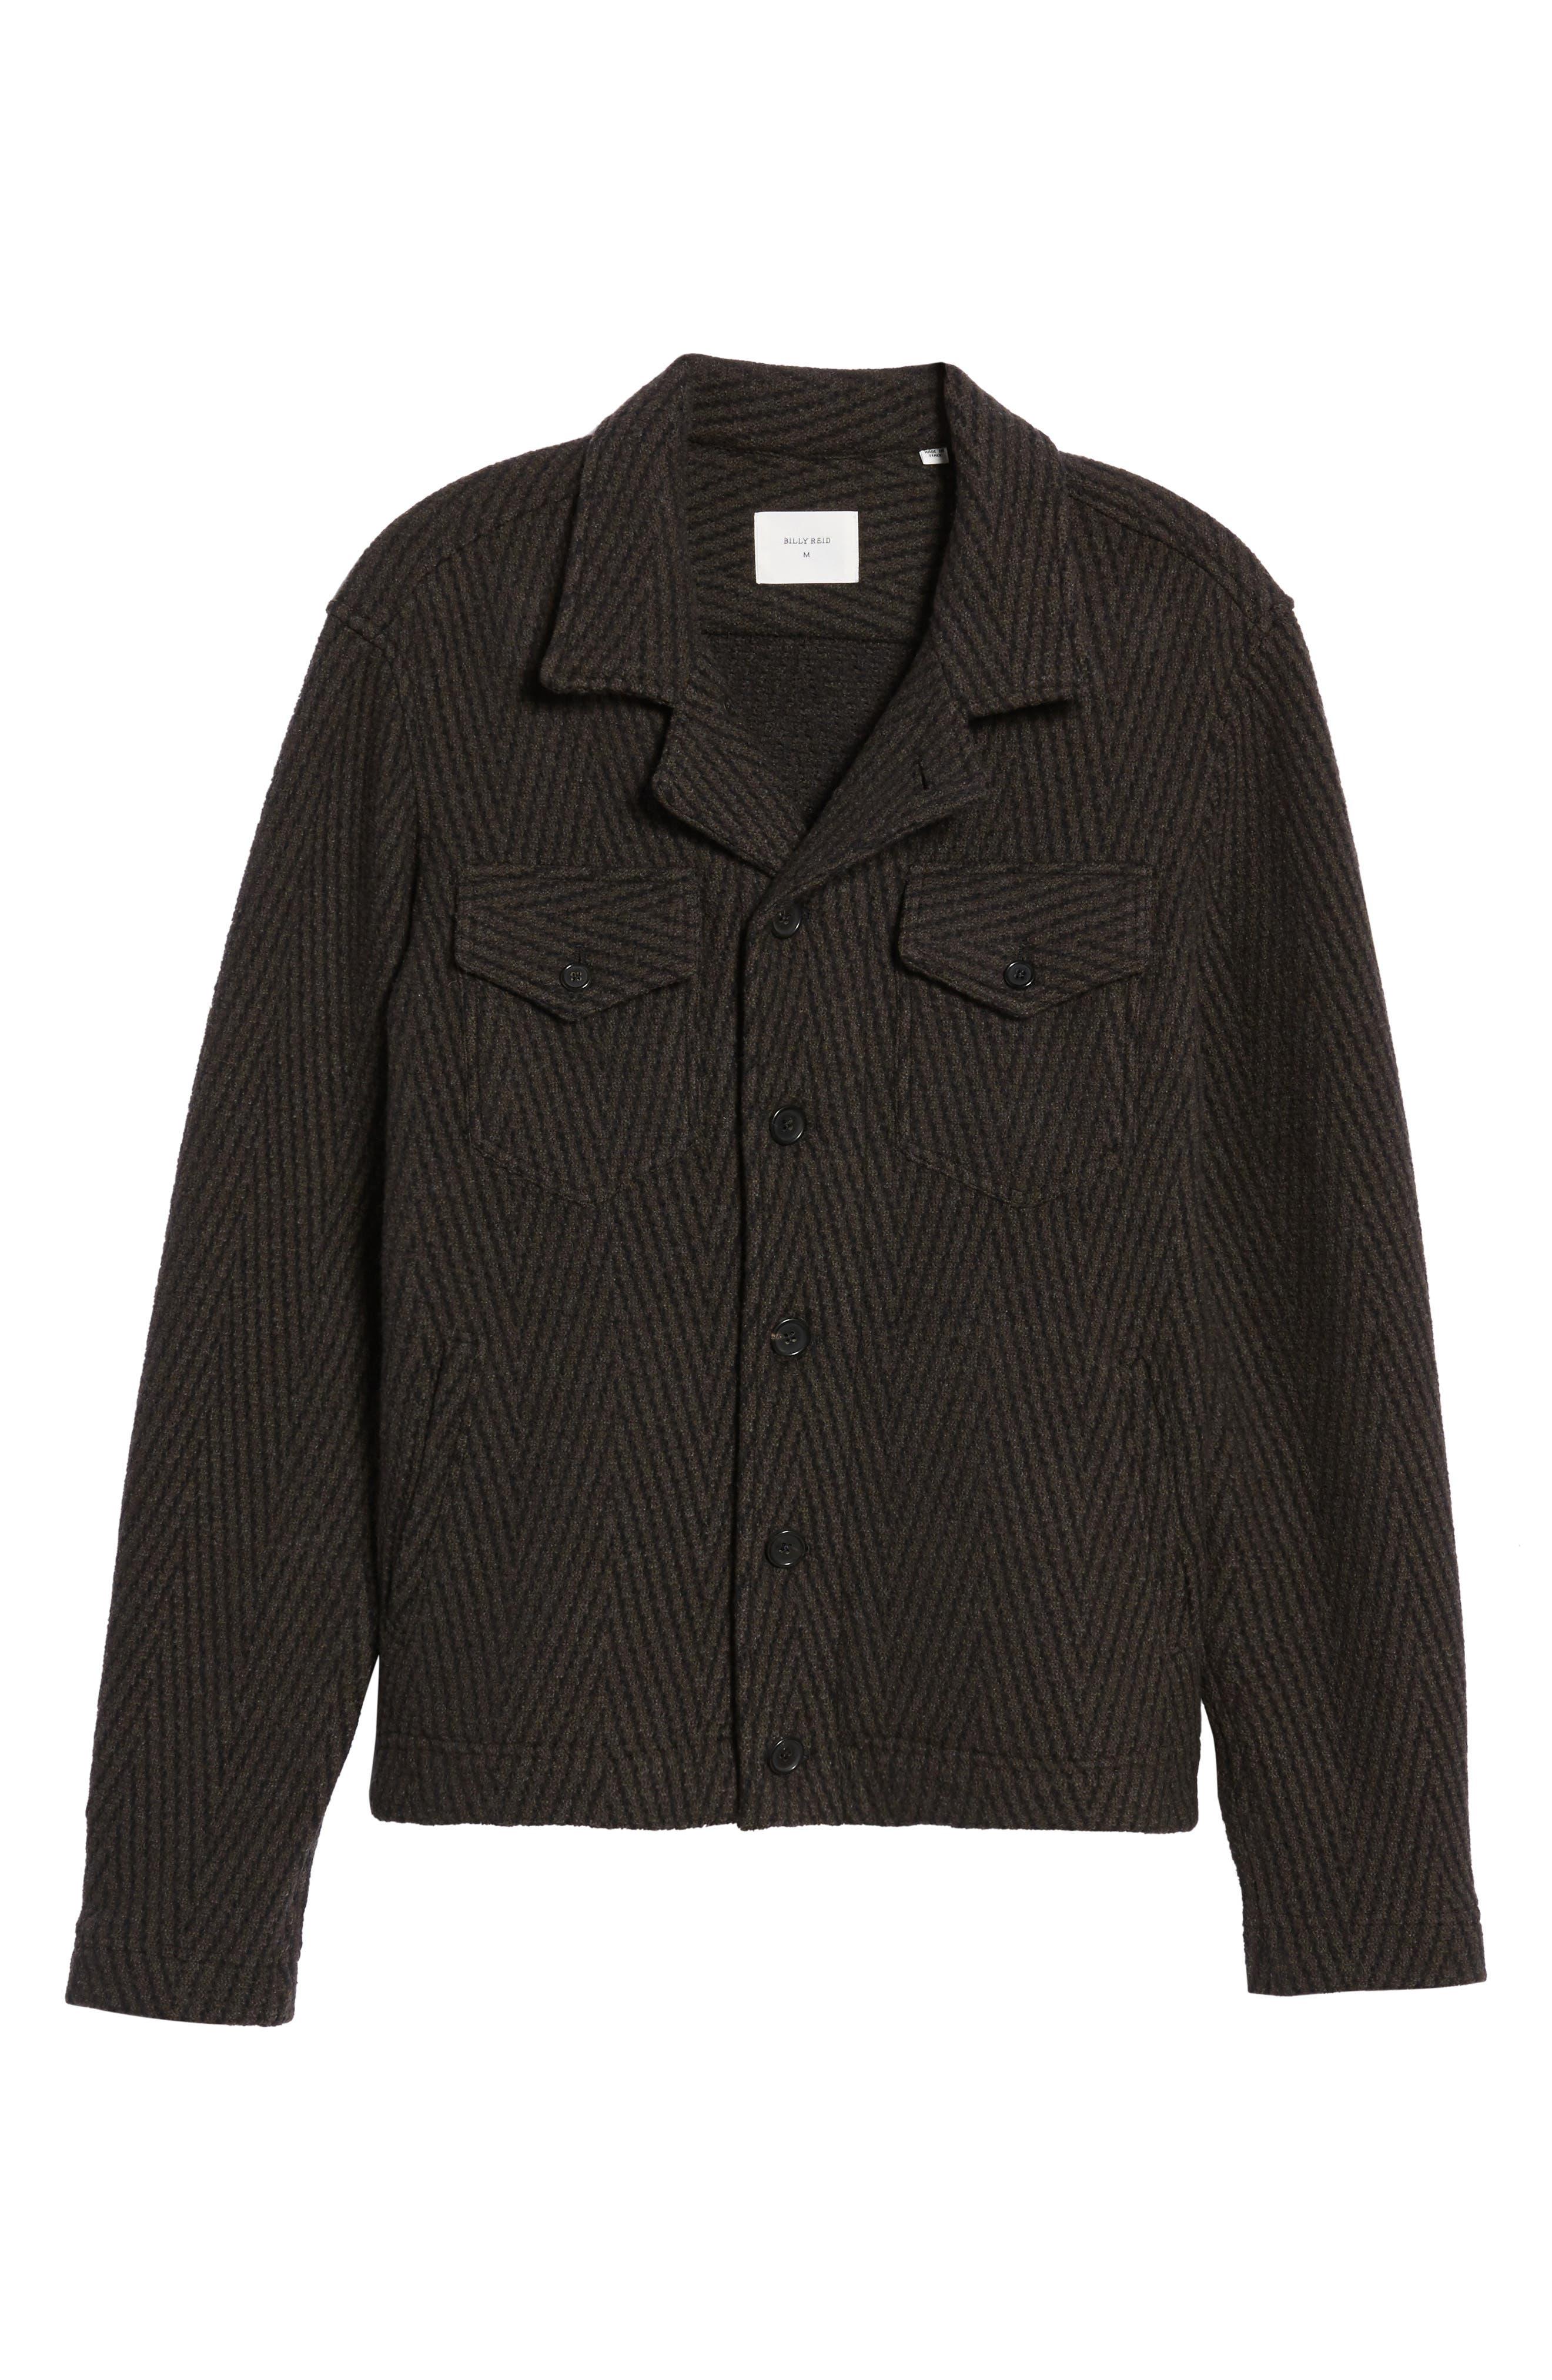 Berger Wool Shirt Jacket,                             Alternate thumbnail 5, color,                             200